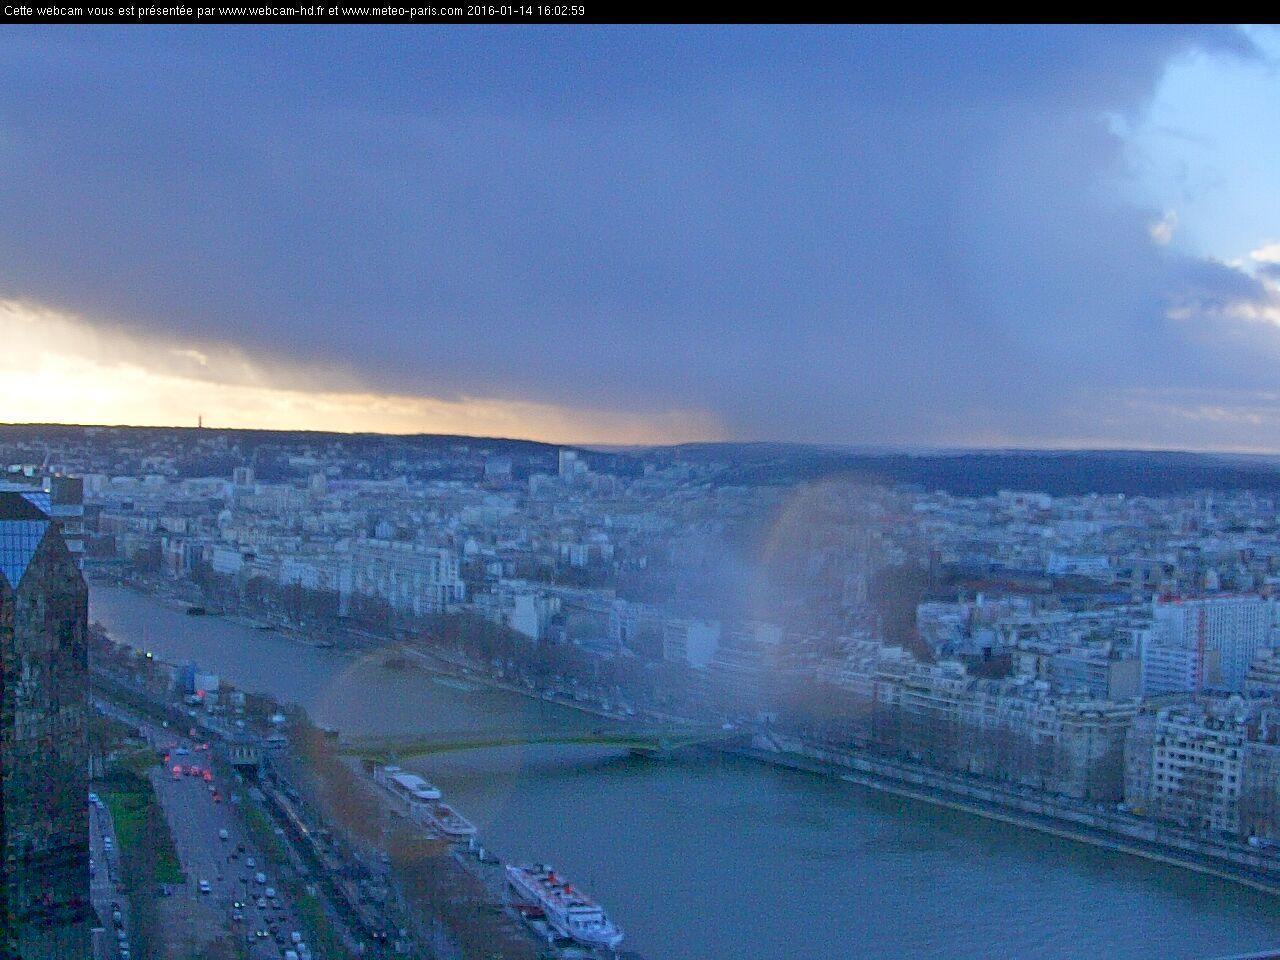 http://www.webcam-hd.fr/images/pariscam2/webcam_pariscam2_5min.jpg